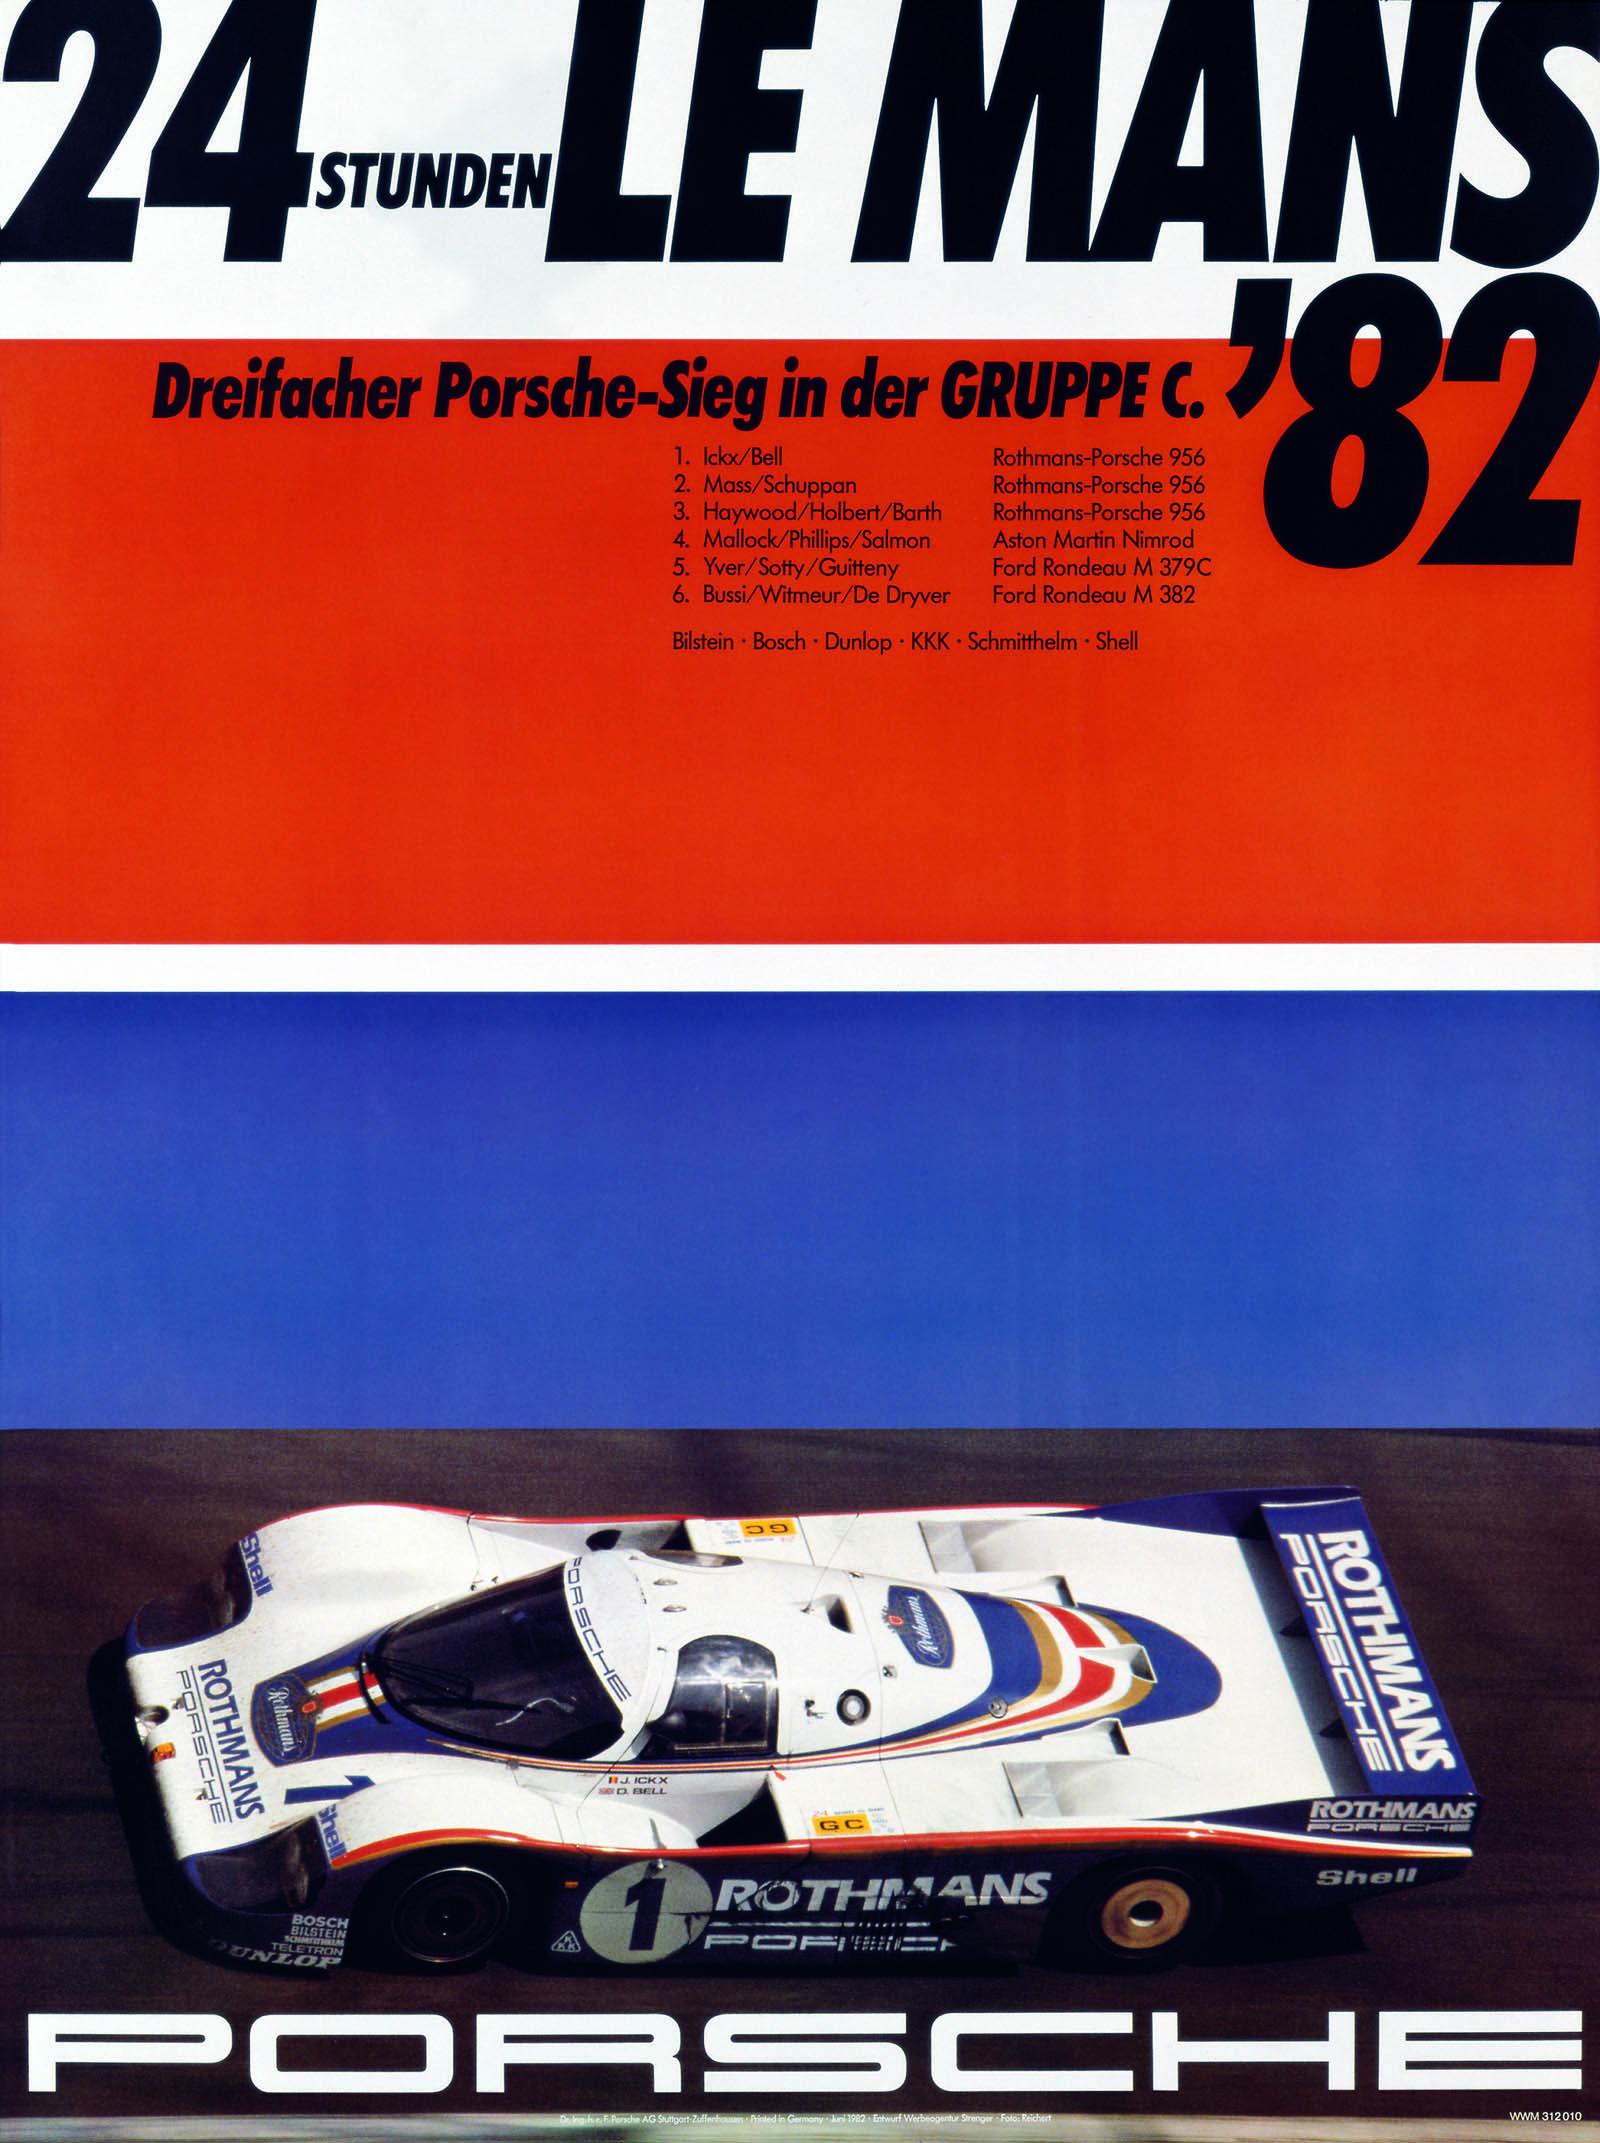 Porsche Poster for the 1982 Le Mans 24